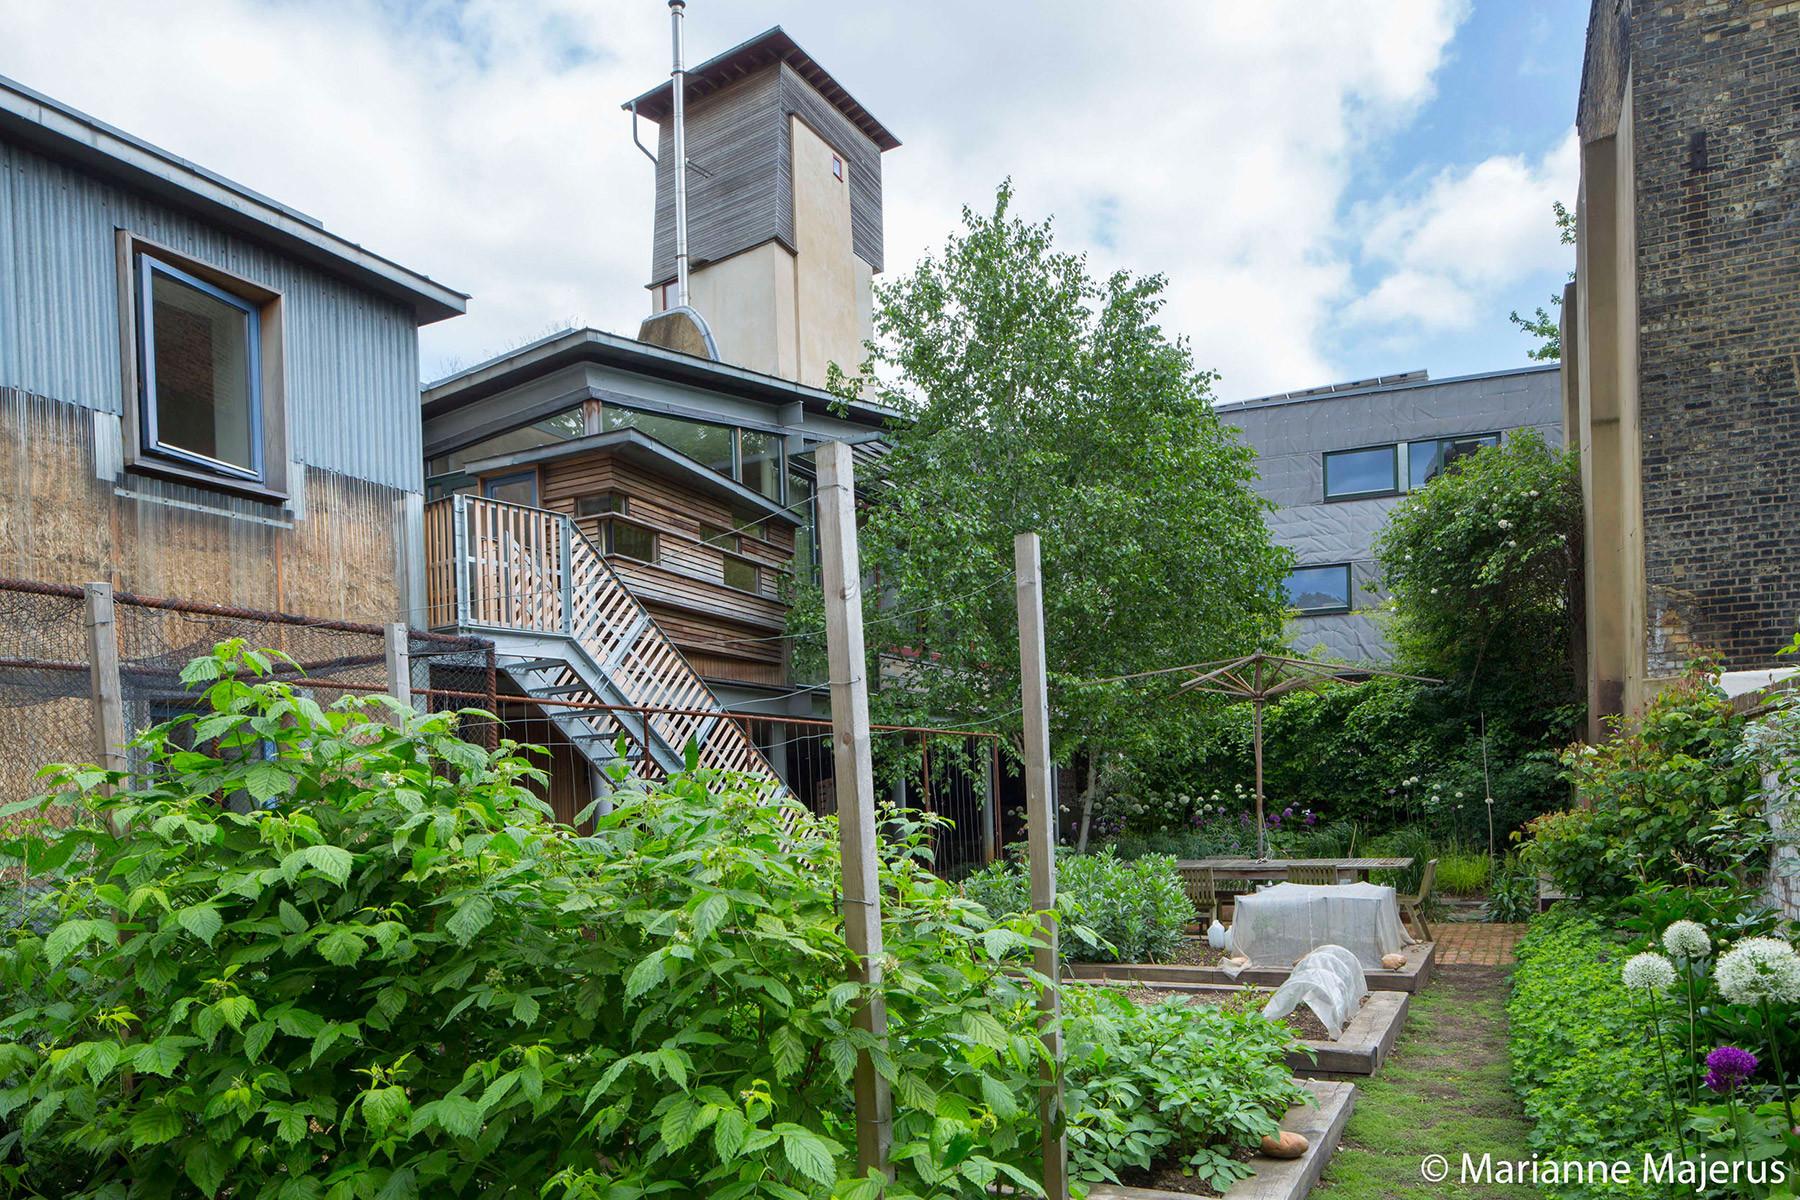 Sarah-Wigglesworth-Architects Stock-Orchard-Street Majerus 1800